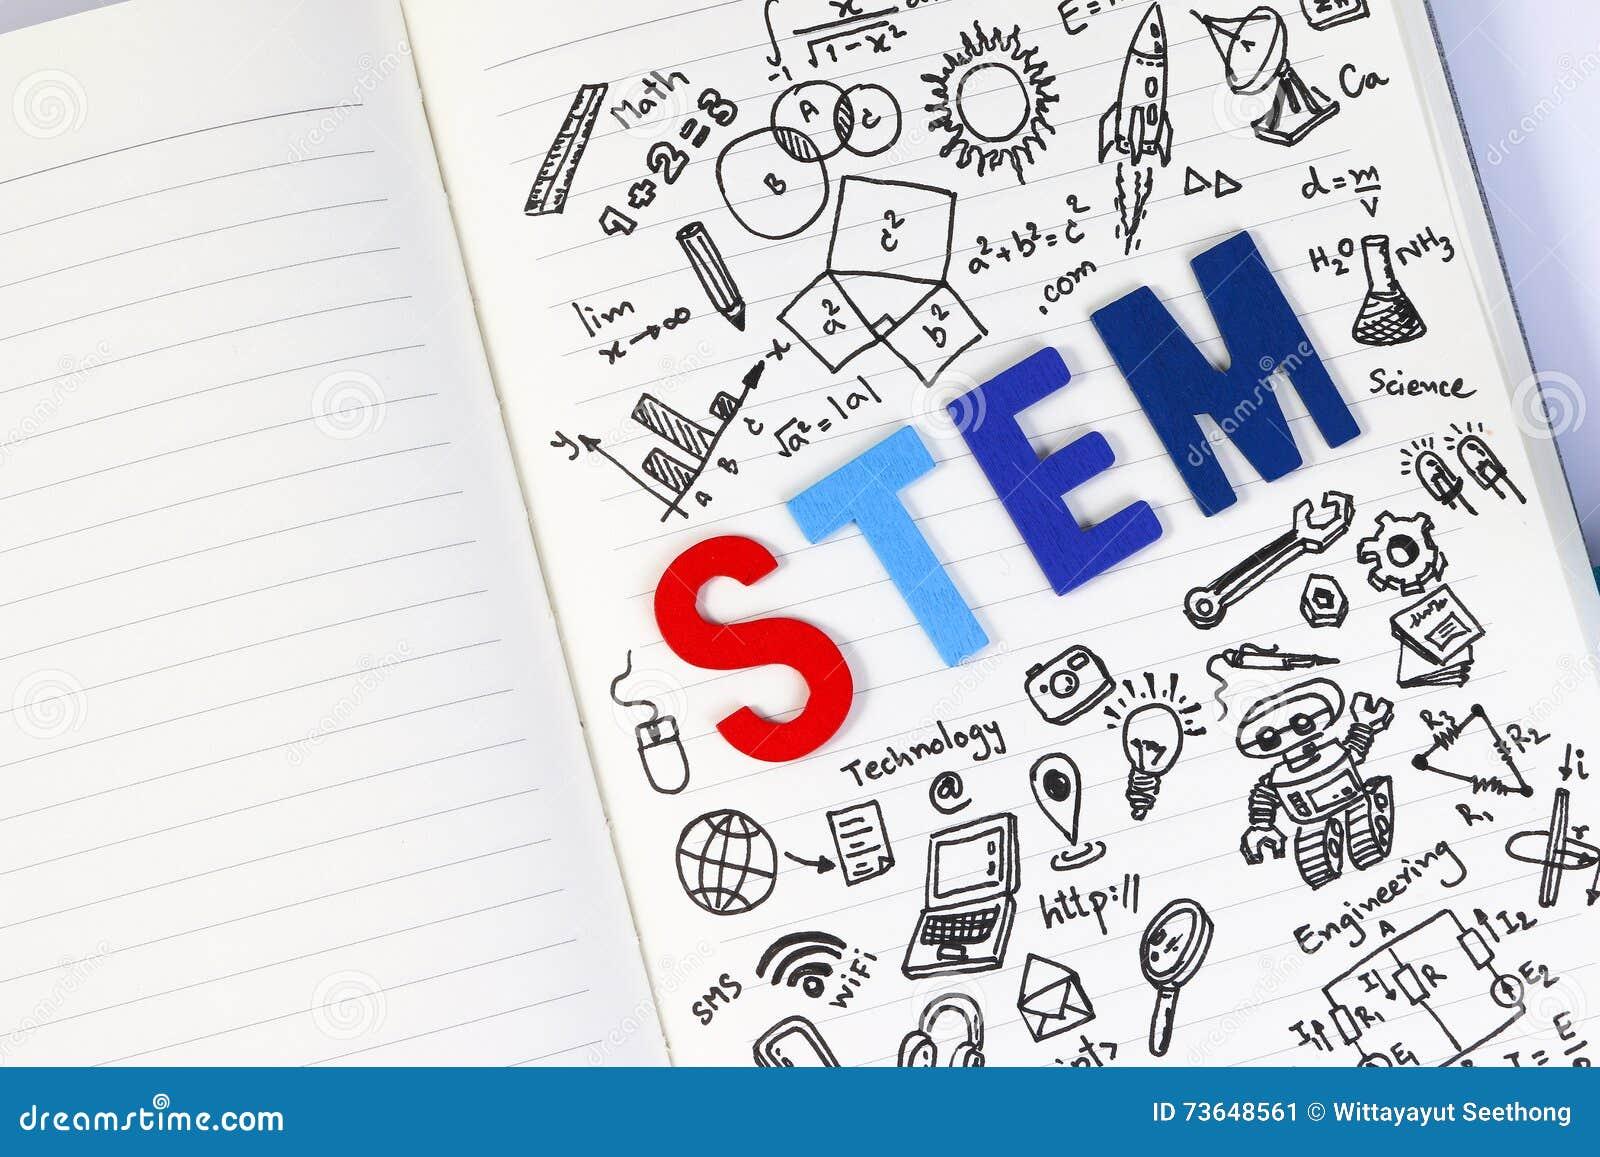 STEM education. Science Technology Engineering Mathematics.